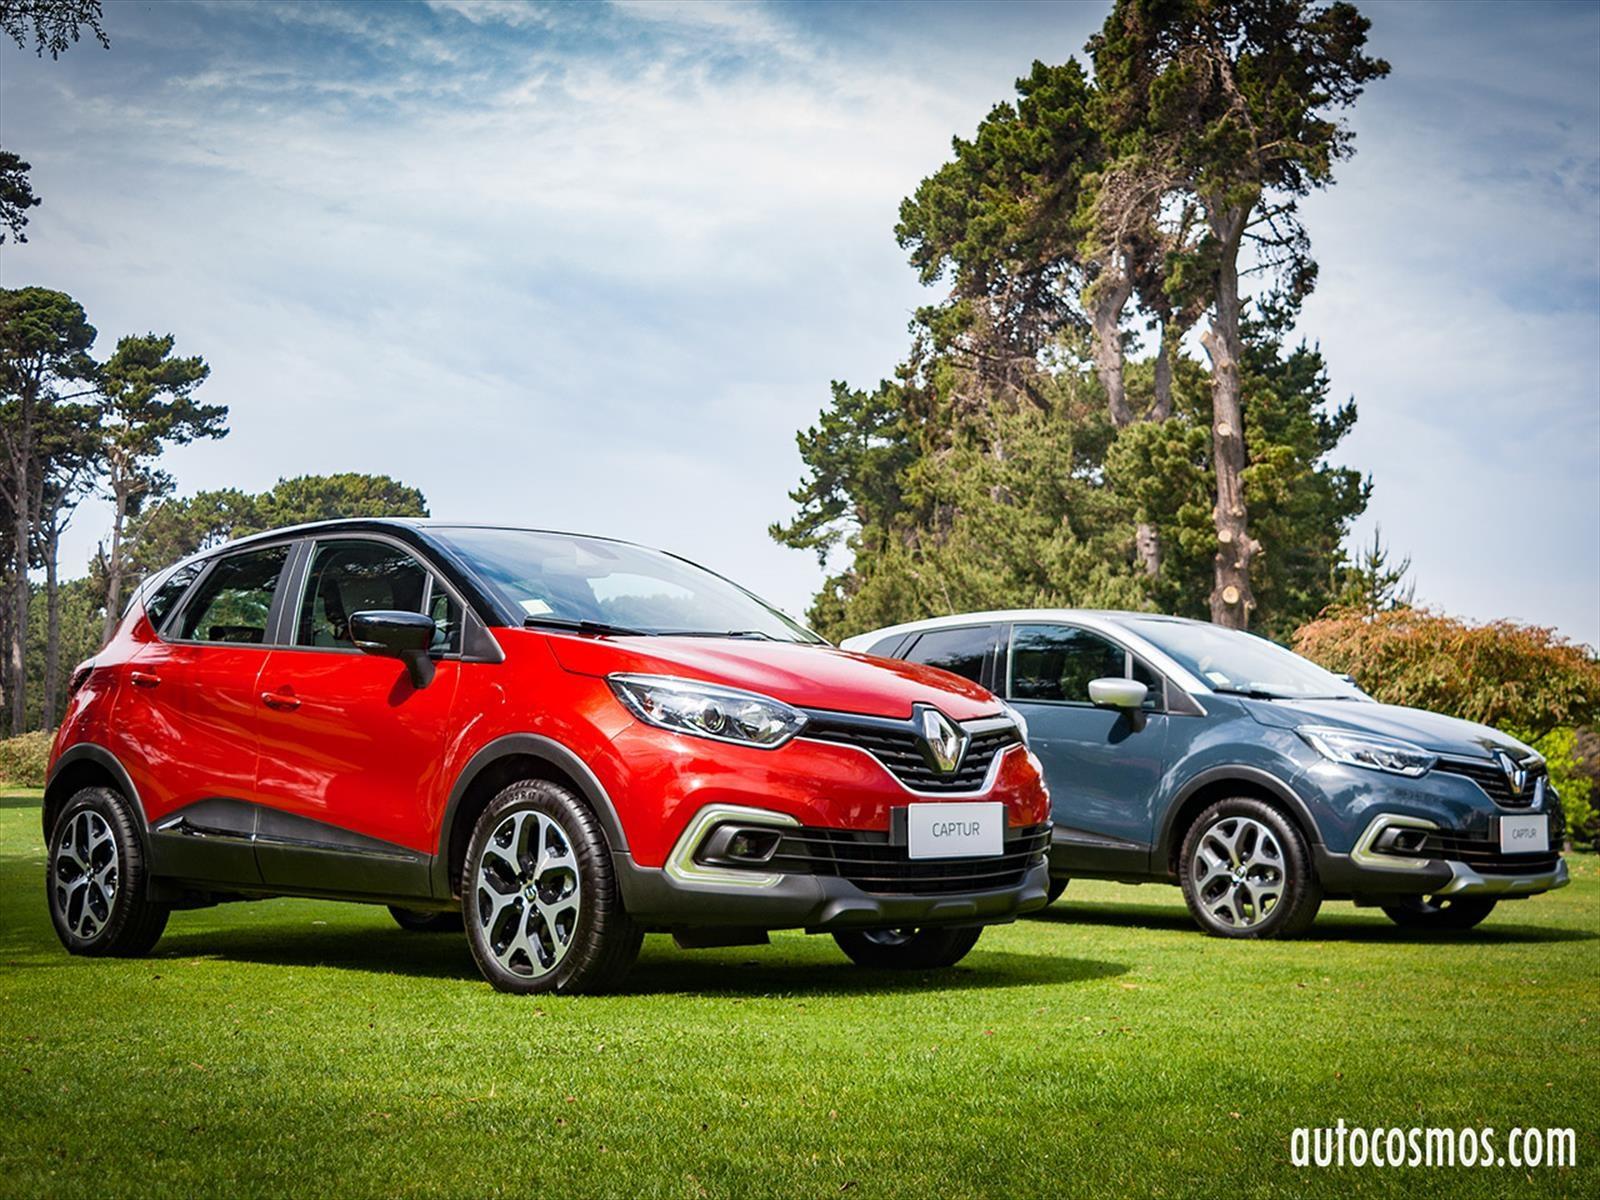 Renault Captur Fase II 2018 sale a la venta